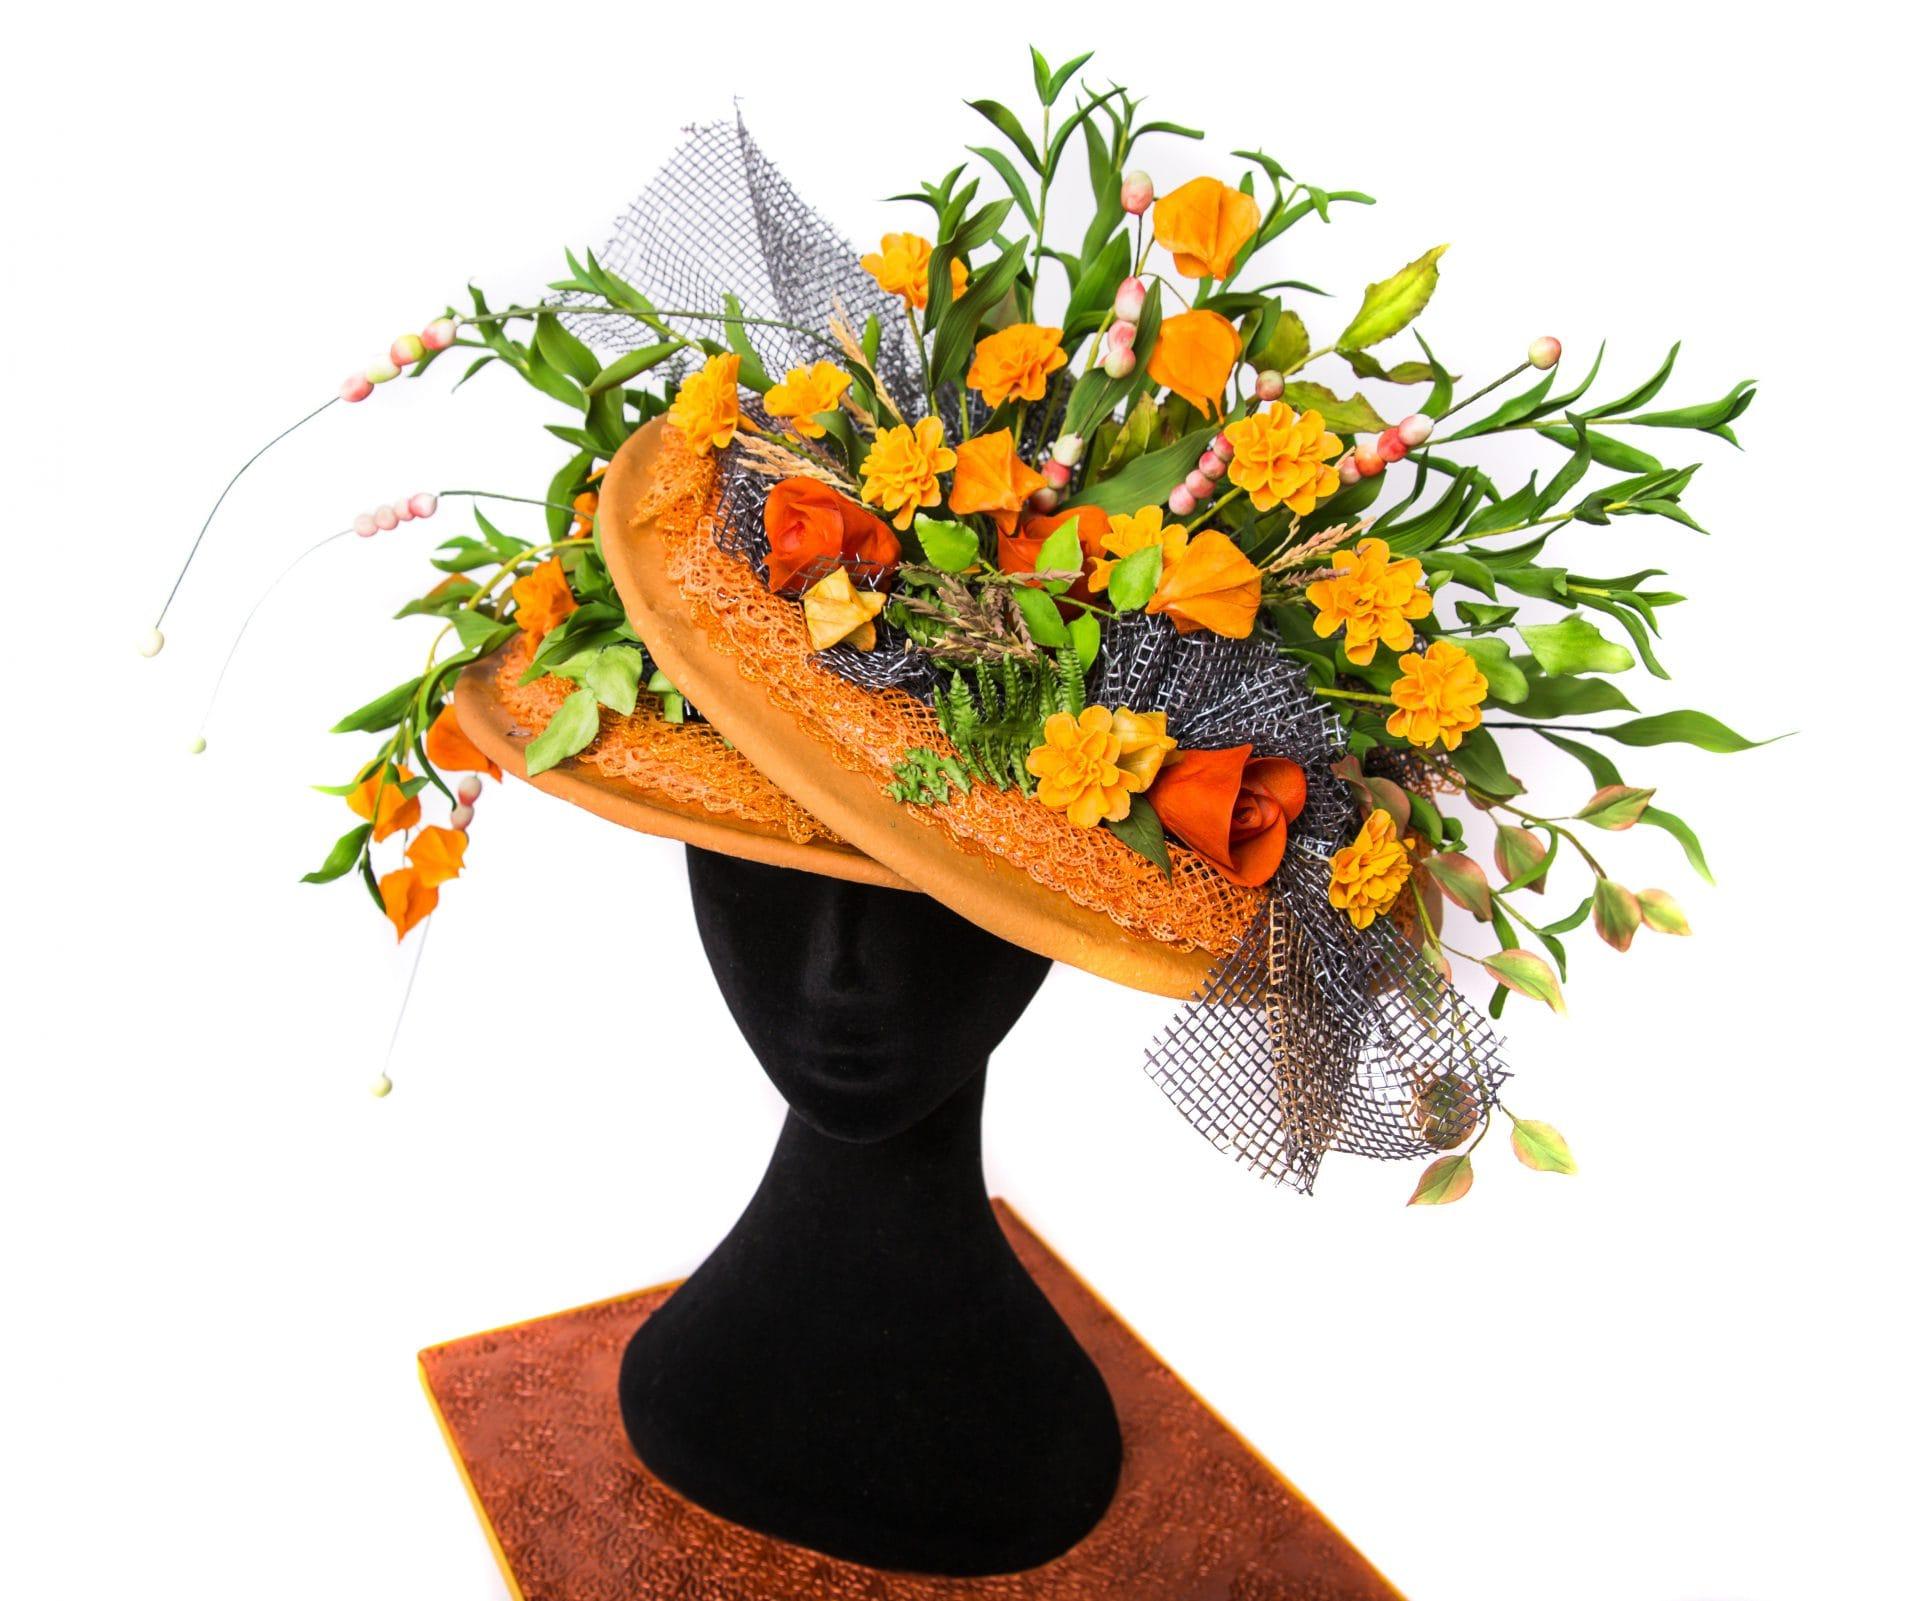 Karen Blackwell - Butterfly Cakes and Bakes. Hat Inspiration: Neil Whittaker at Design Element Flowers www.designelementflowers.com